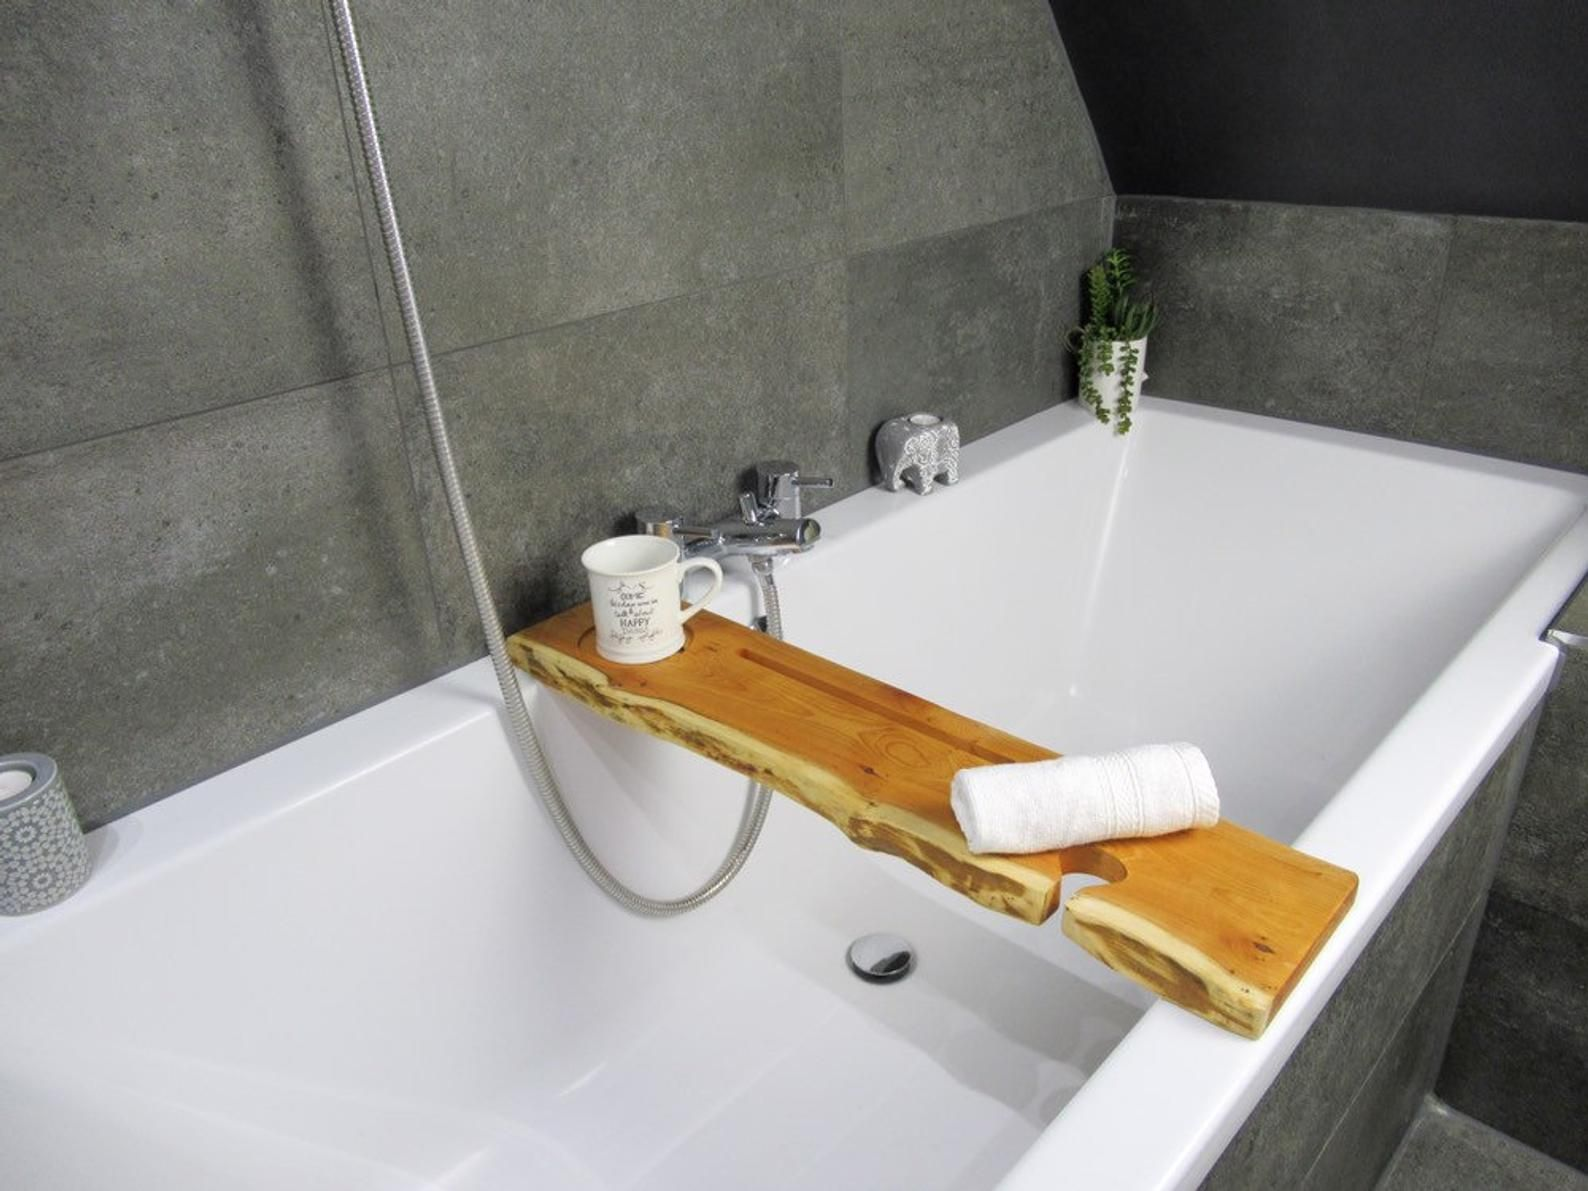 Live Edge Solid Yew Bath Caddy Bespoke Rustic Bath Board Tray Tablet Holder Free Uk P P Rustikale Badezimmer Designs Badezimmer Design Design